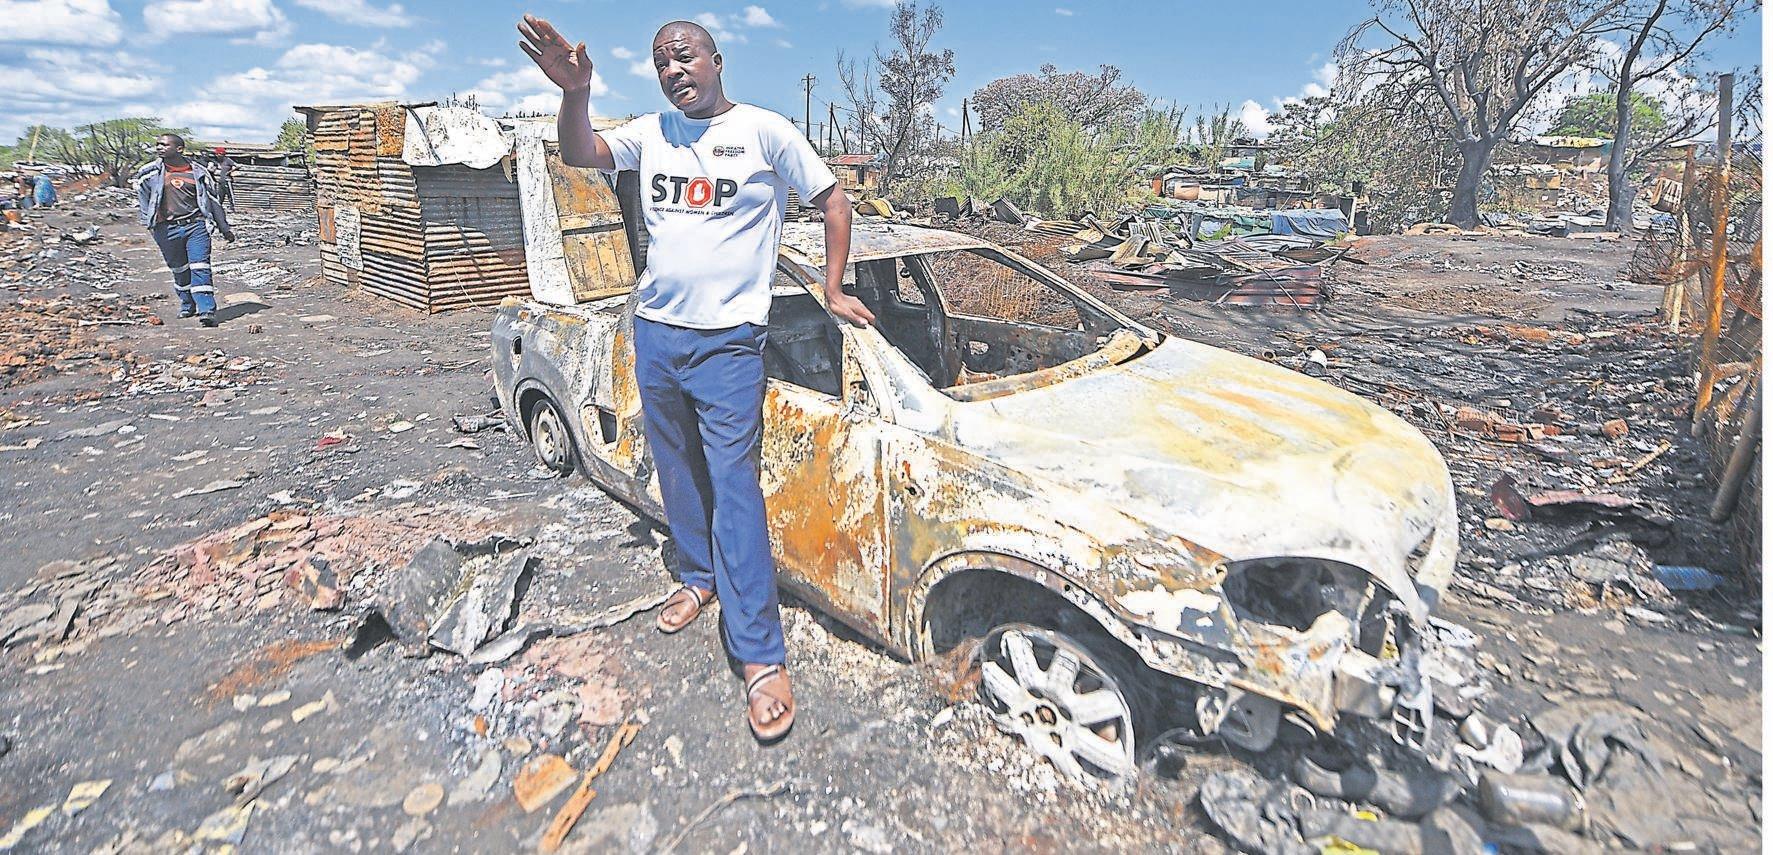 PHOTO: Moeketsi MamaneIFP councillor Sifiso Nene lost his bakkie and spaza shop in the Jika Joe fire.